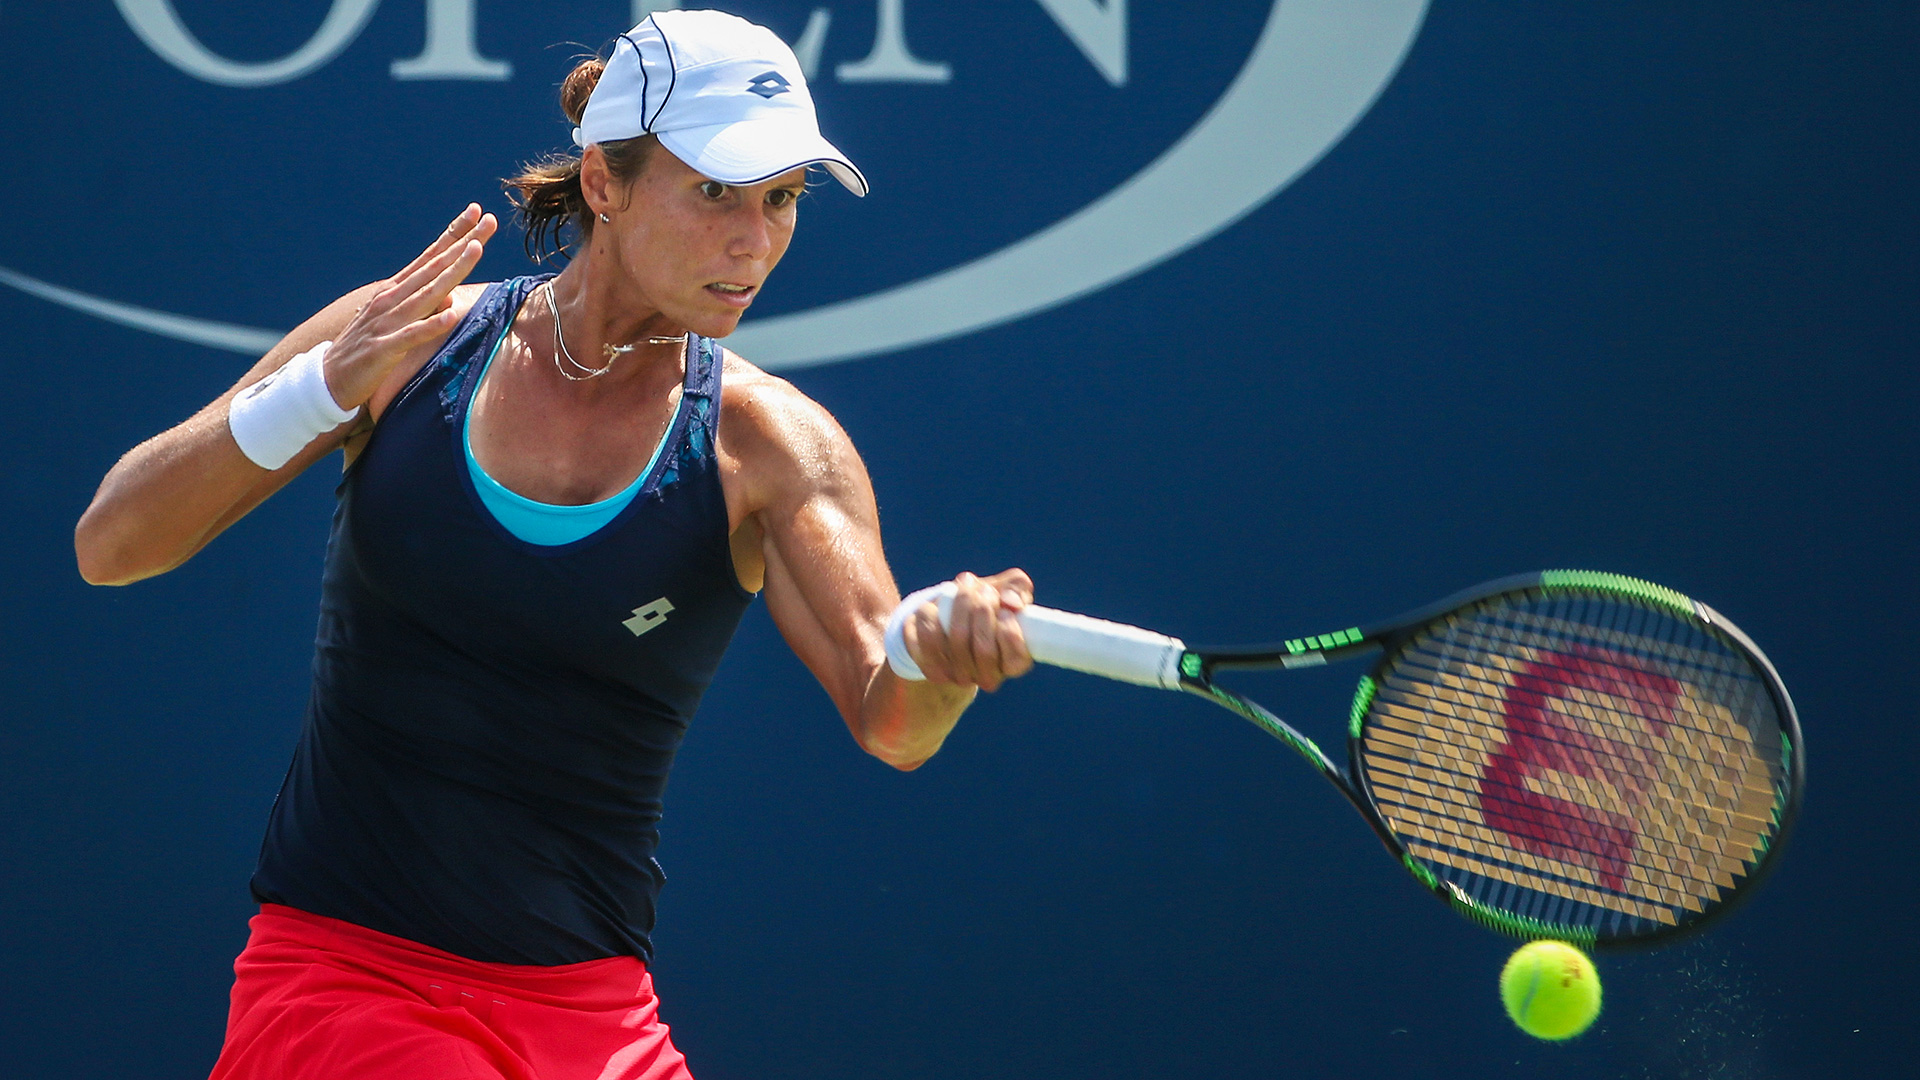 U.S. player Varvara Lepchenko joins seeds in advance to ...Varvara Lepchenko Ranking